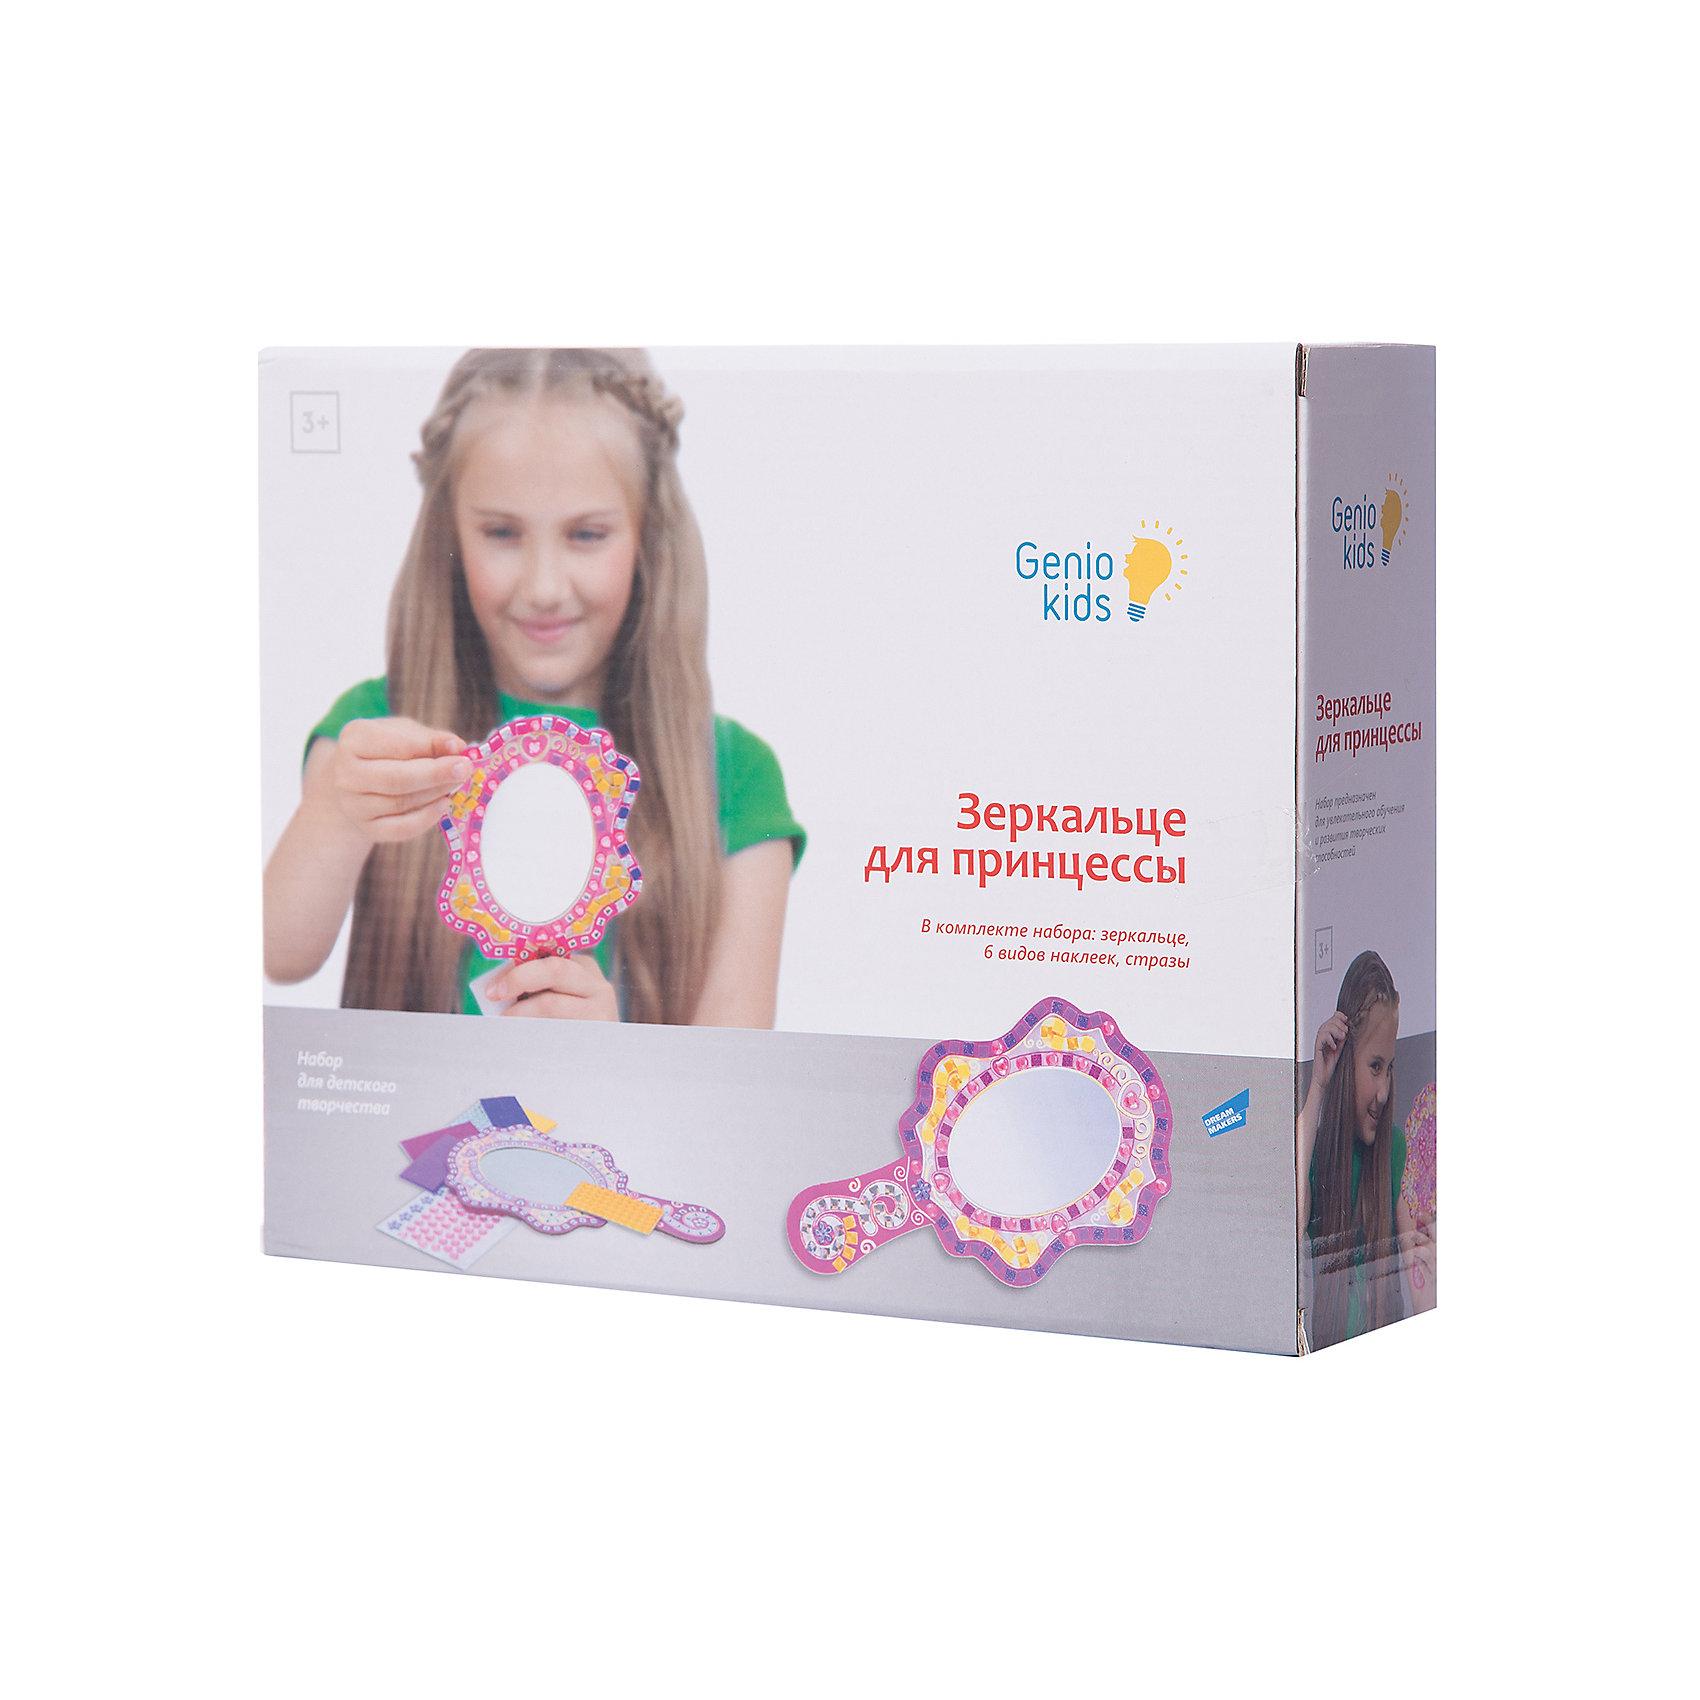 "Genio Kids Набор для детского творчества ""Зеркальце для принцессы"" genio kids набор для детского творчества ""шкатулка"""